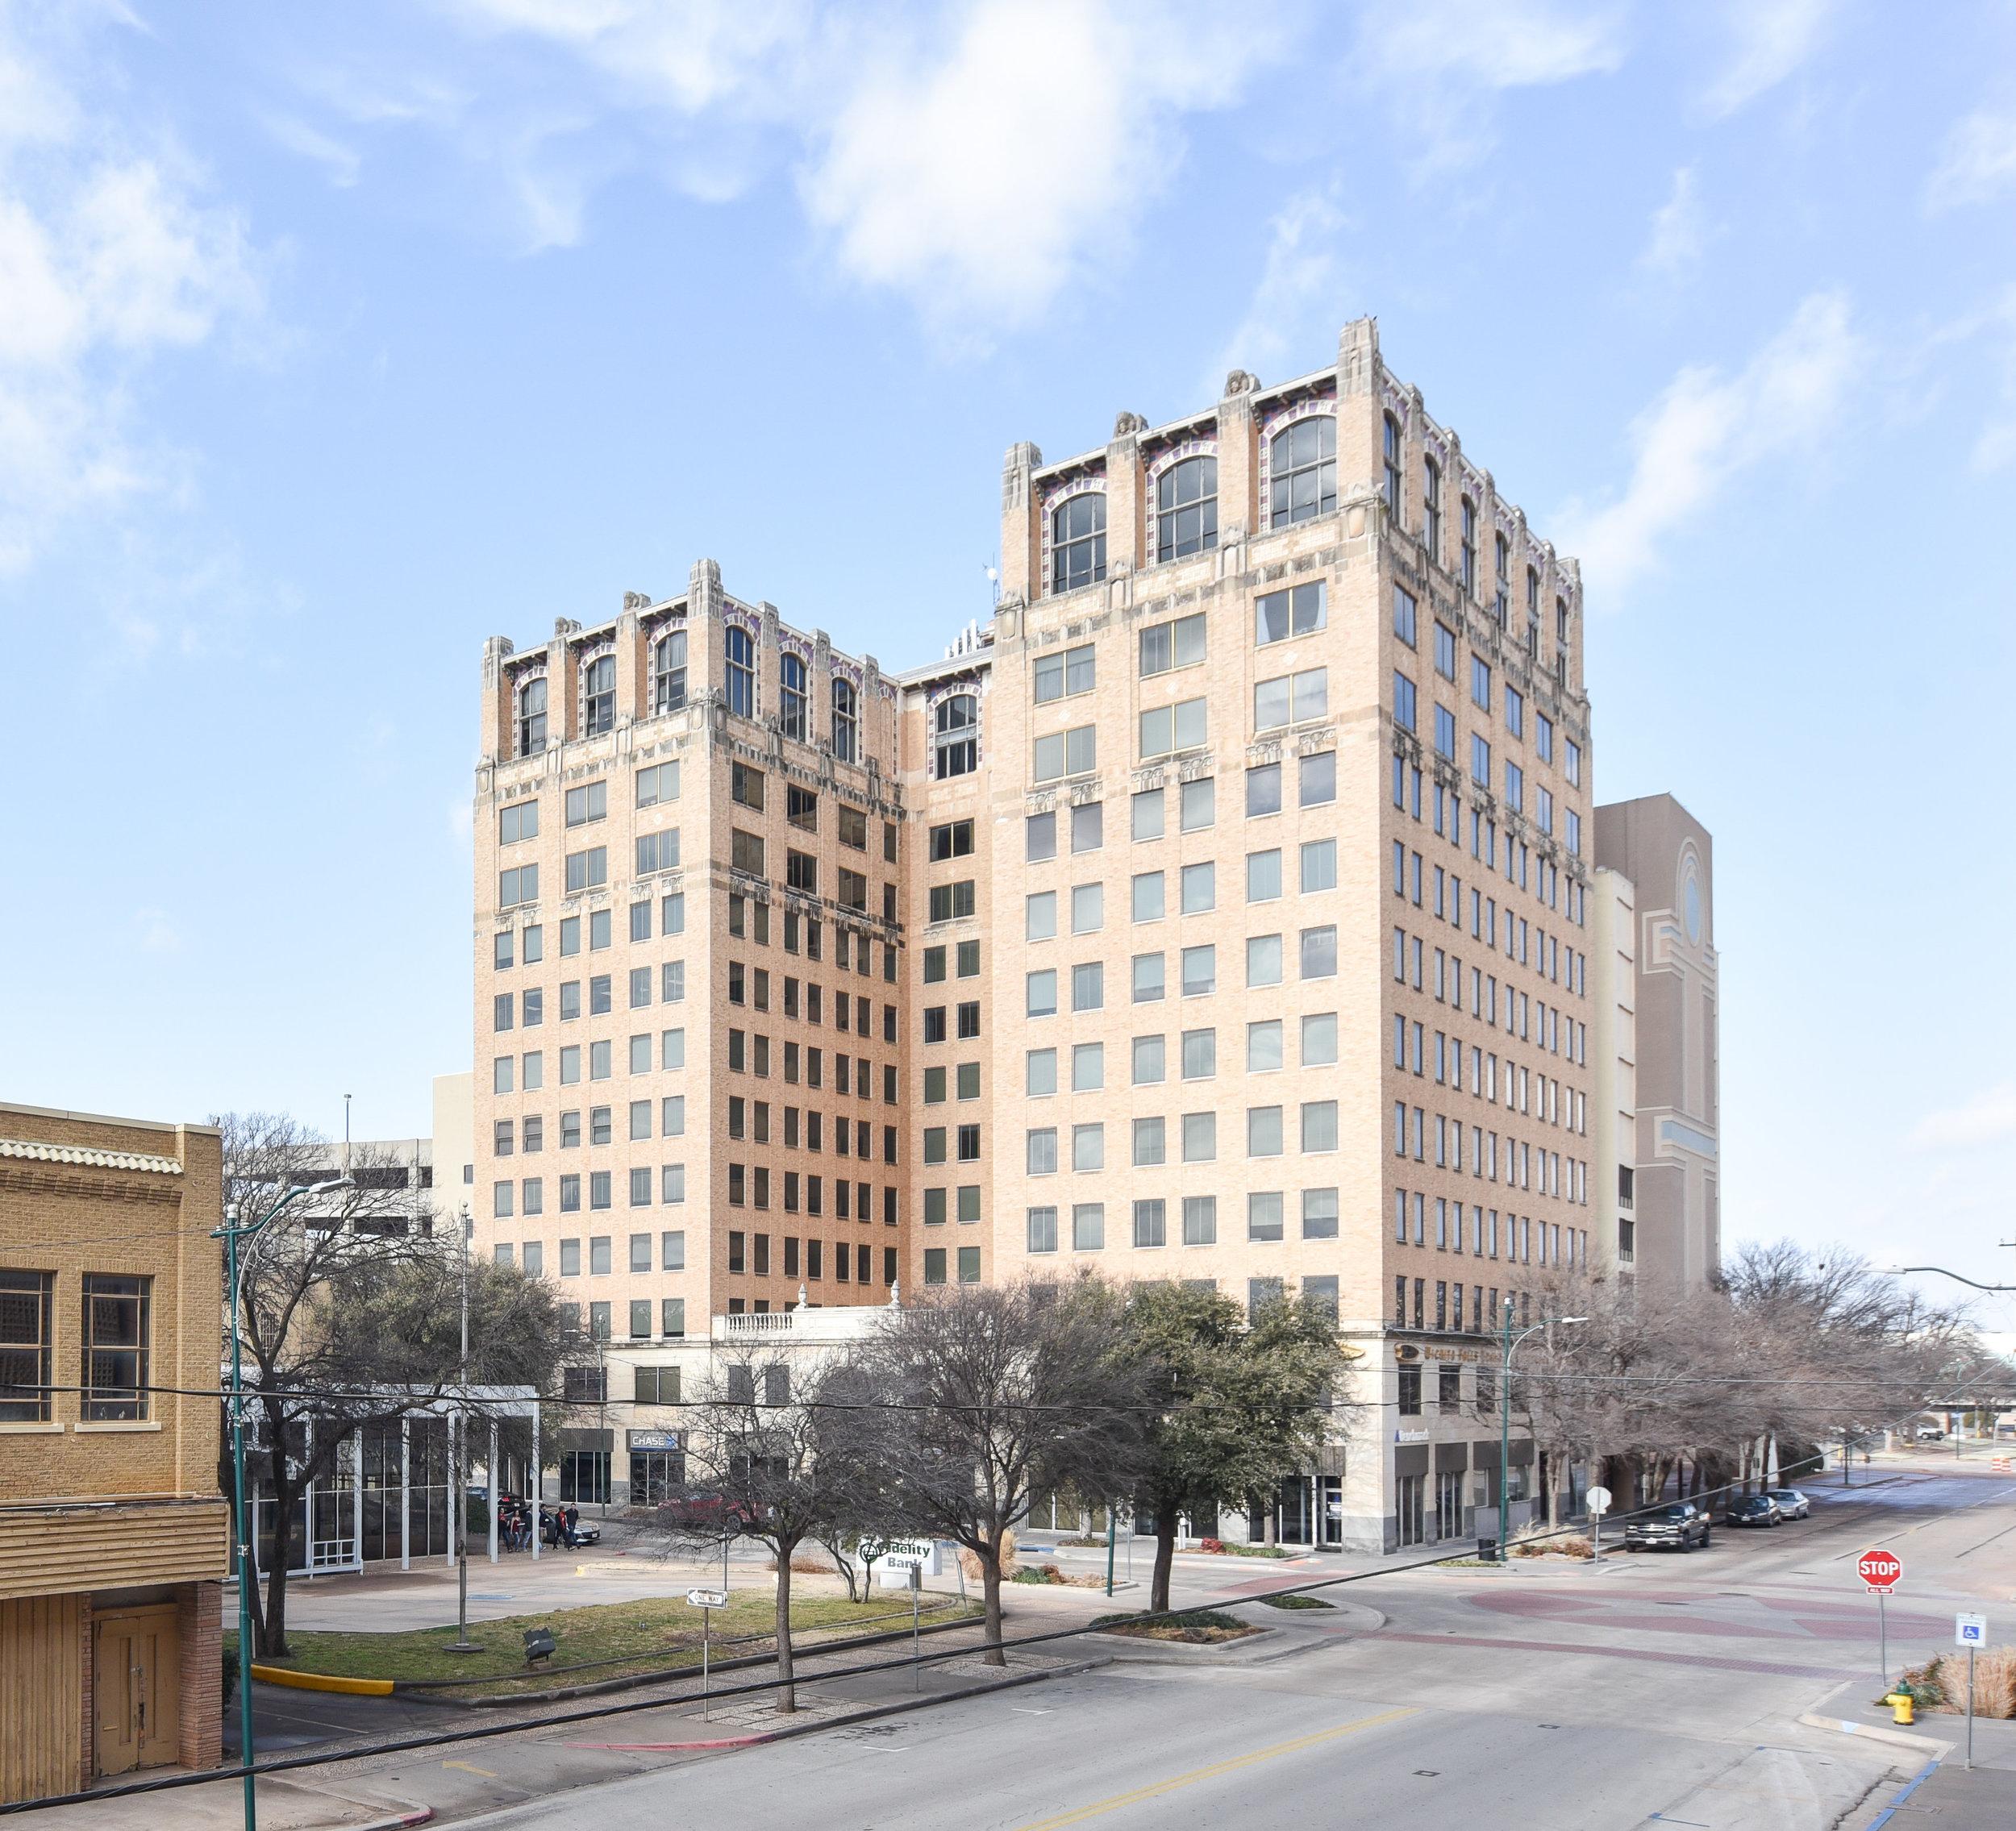 The Hamilton Building